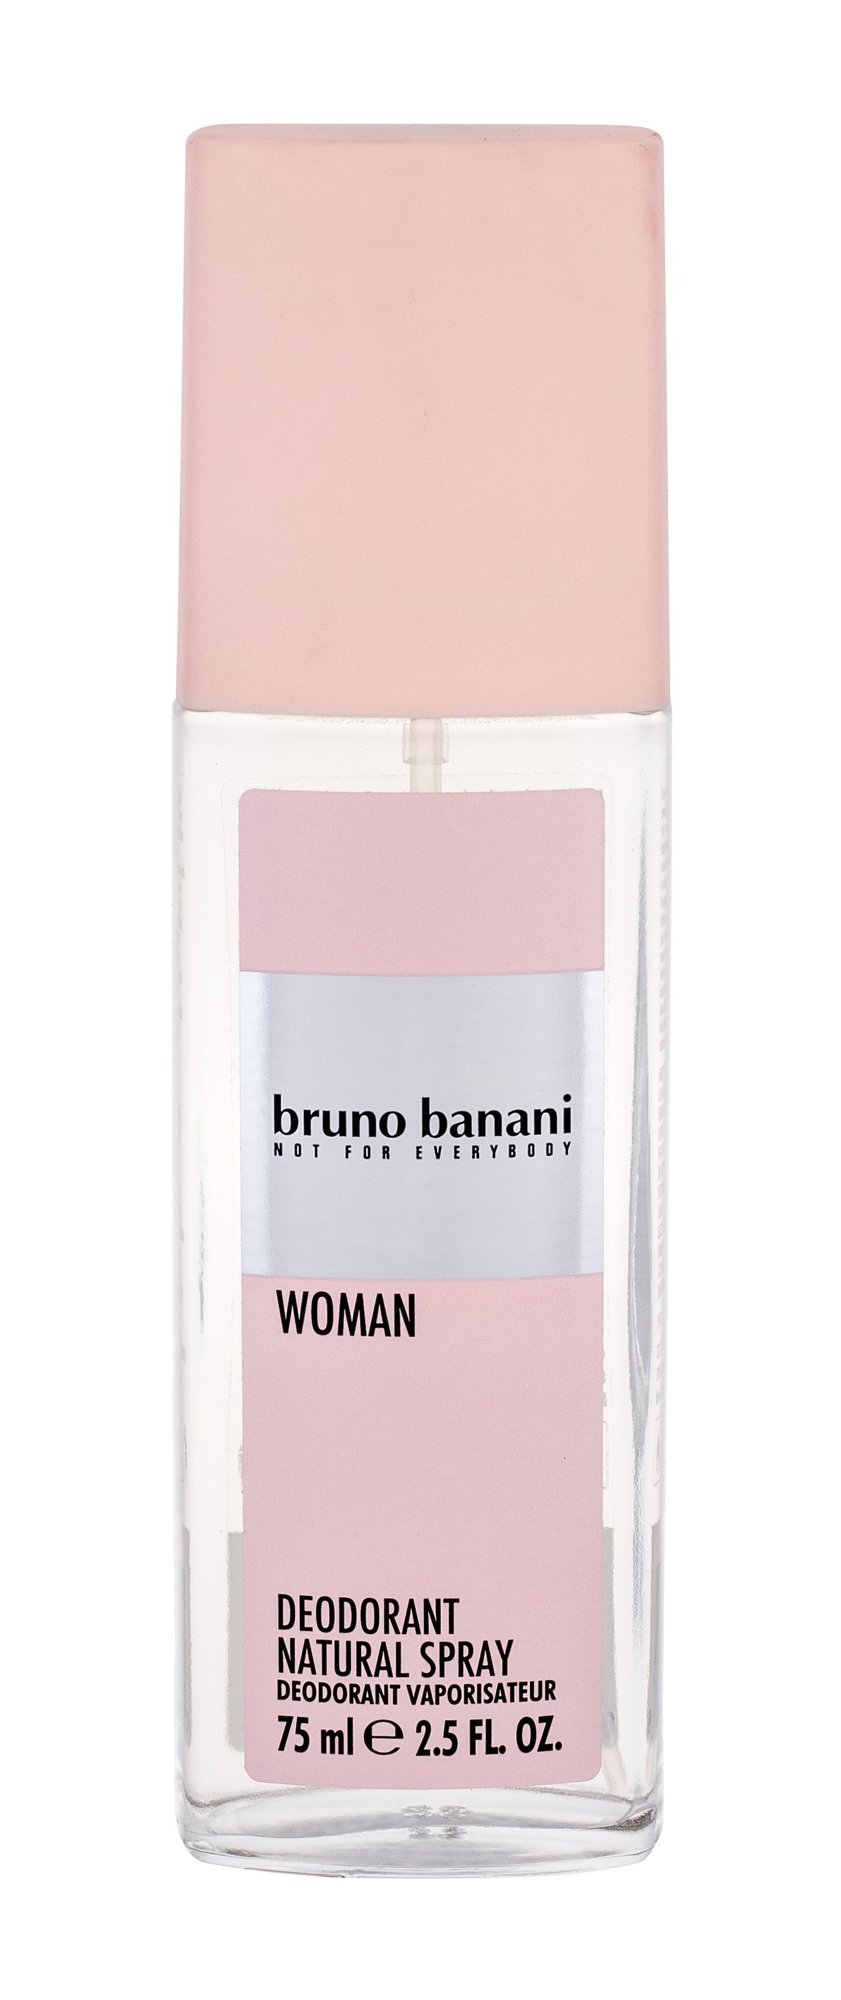 Bruno Banani Woman Deodorant 75ml